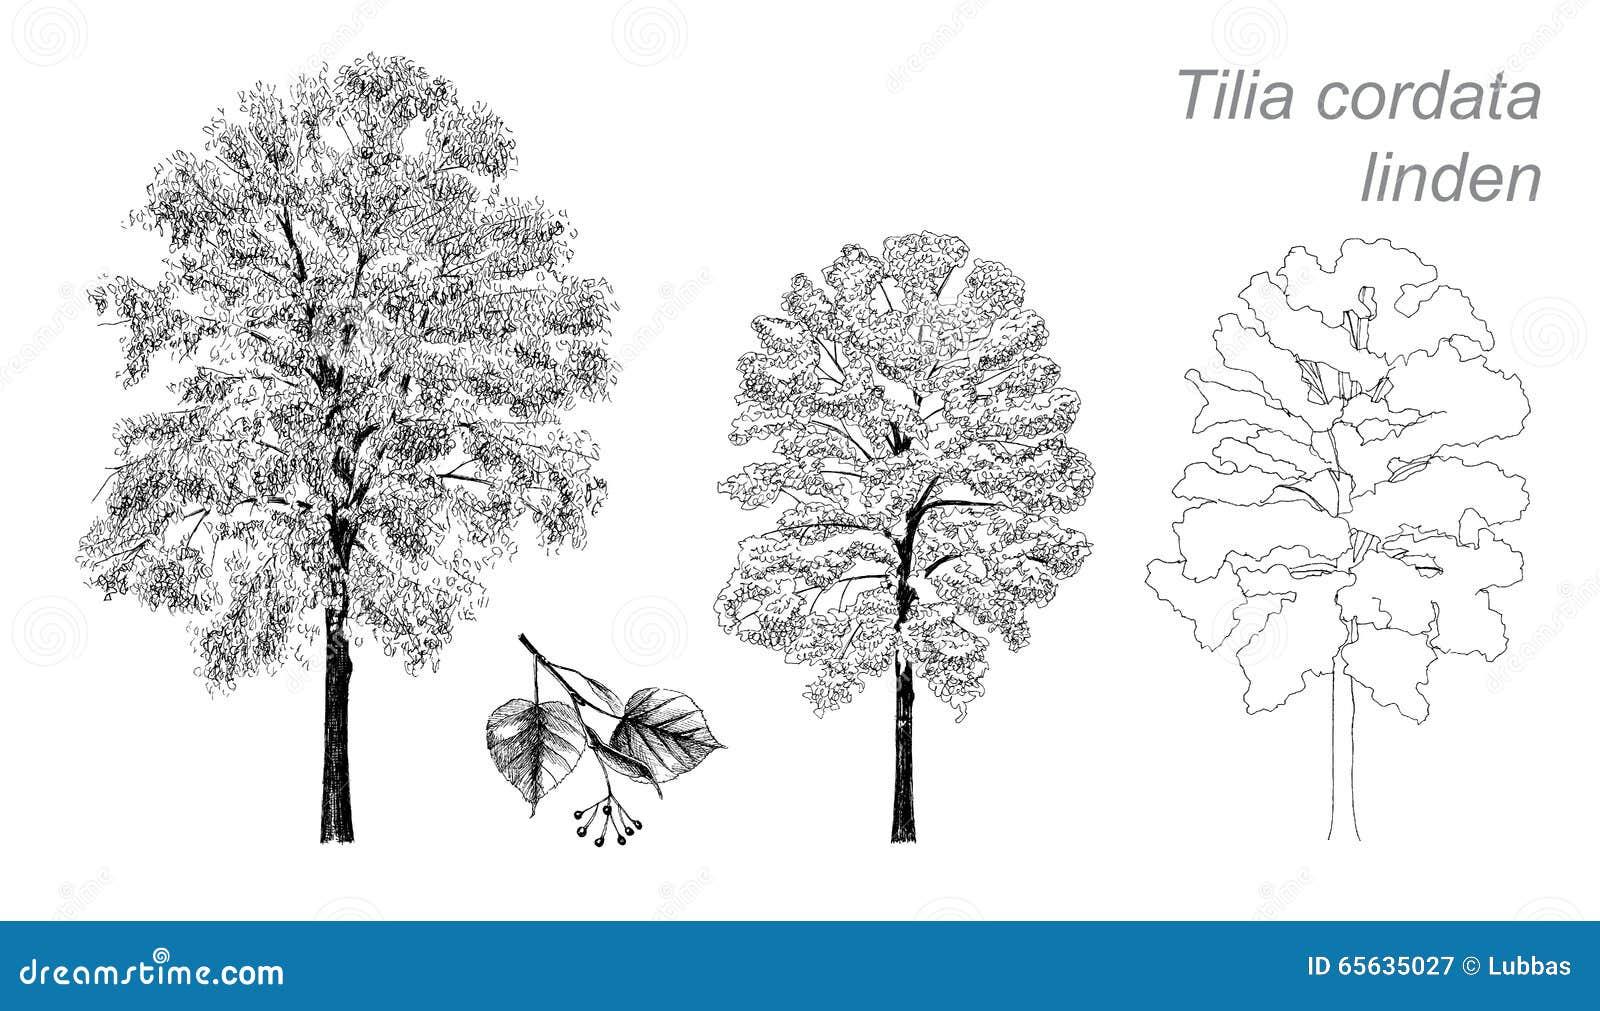 Dessin de vecteur de tilleul (cordata de Tilia)